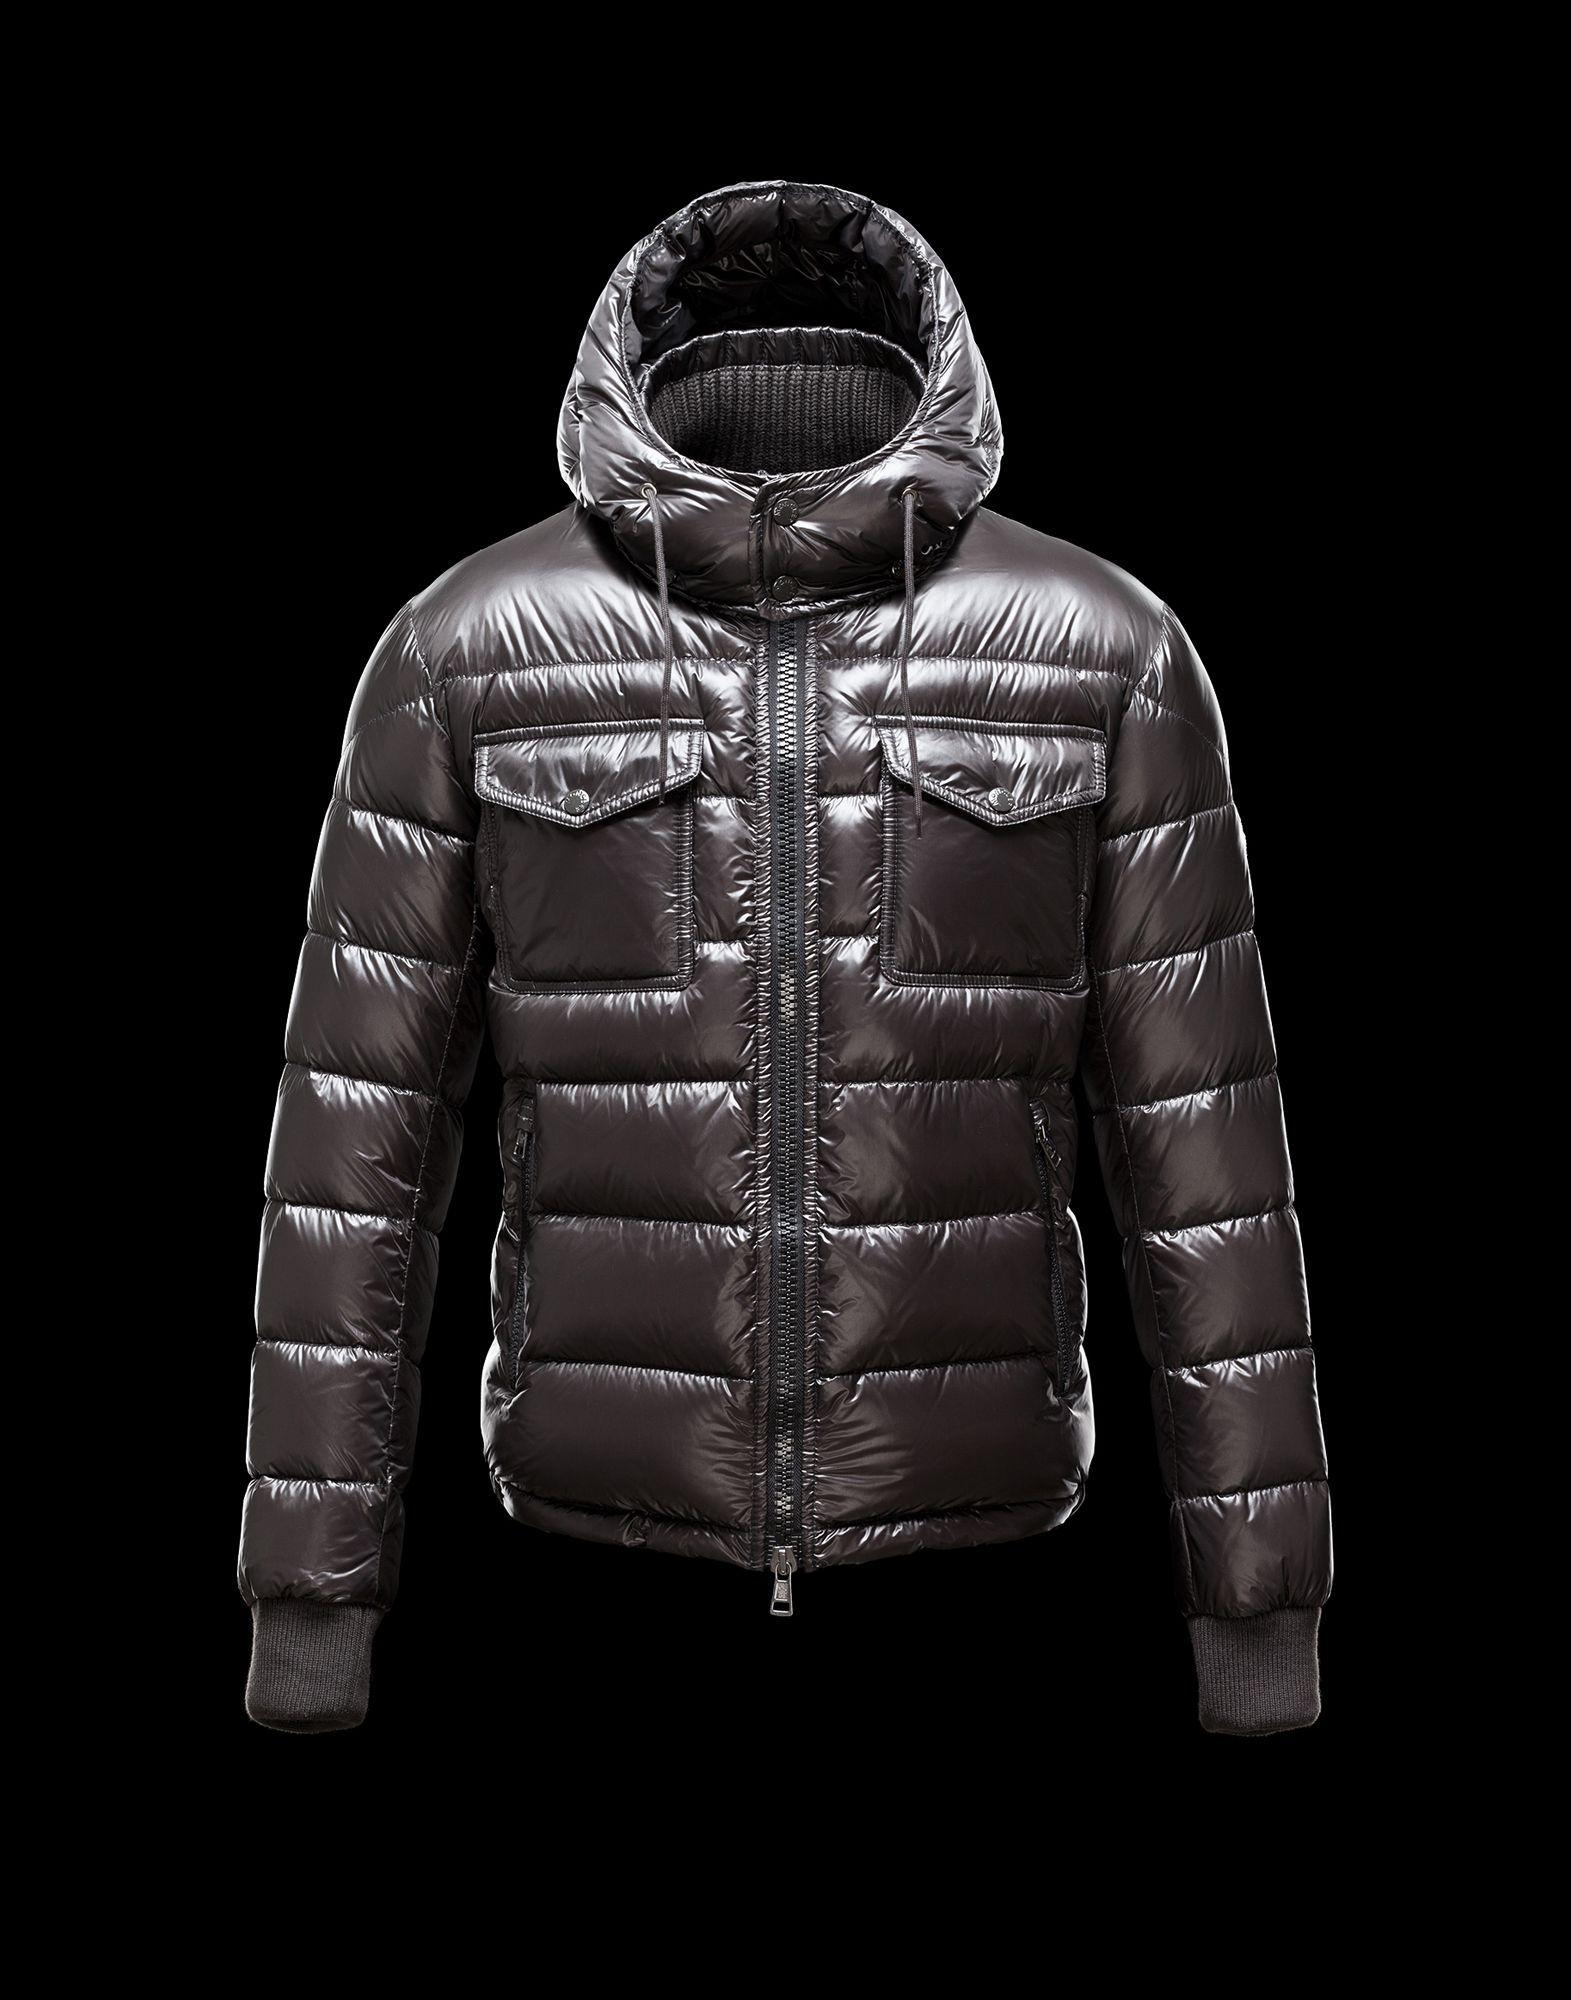 Pin on winter jackets